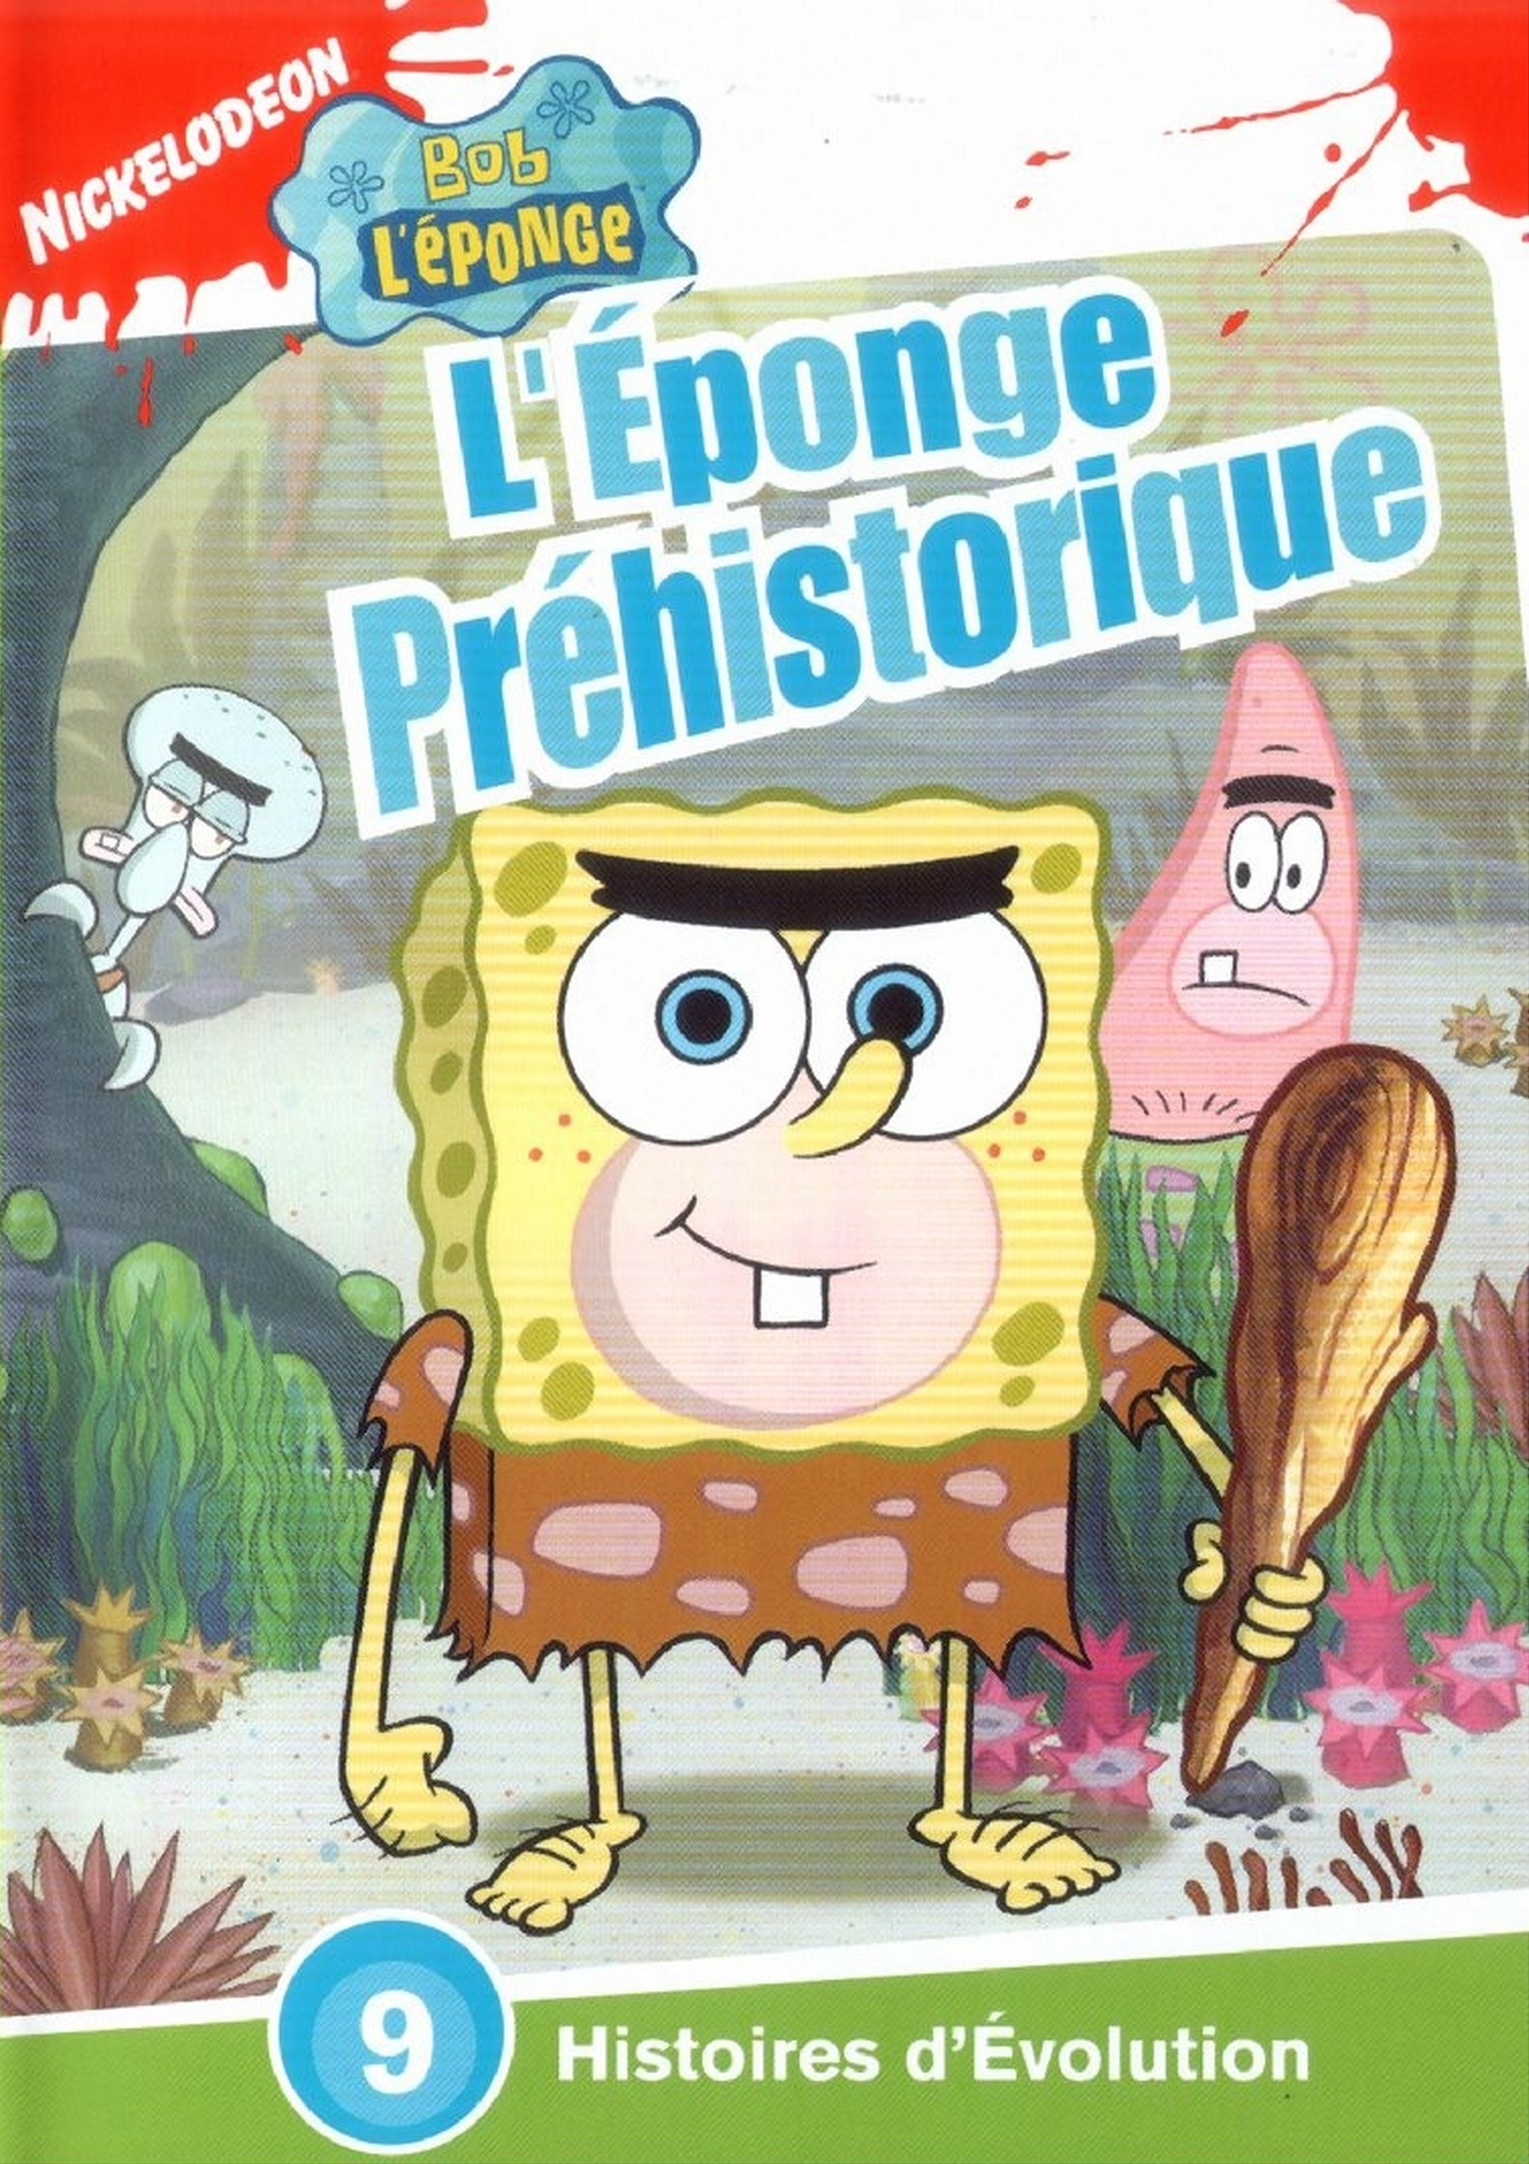 image bob l eponge l eponge prehistorique encyclopedia spongebobia the. Black Bedroom Furniture Sets. Home Design Ideas